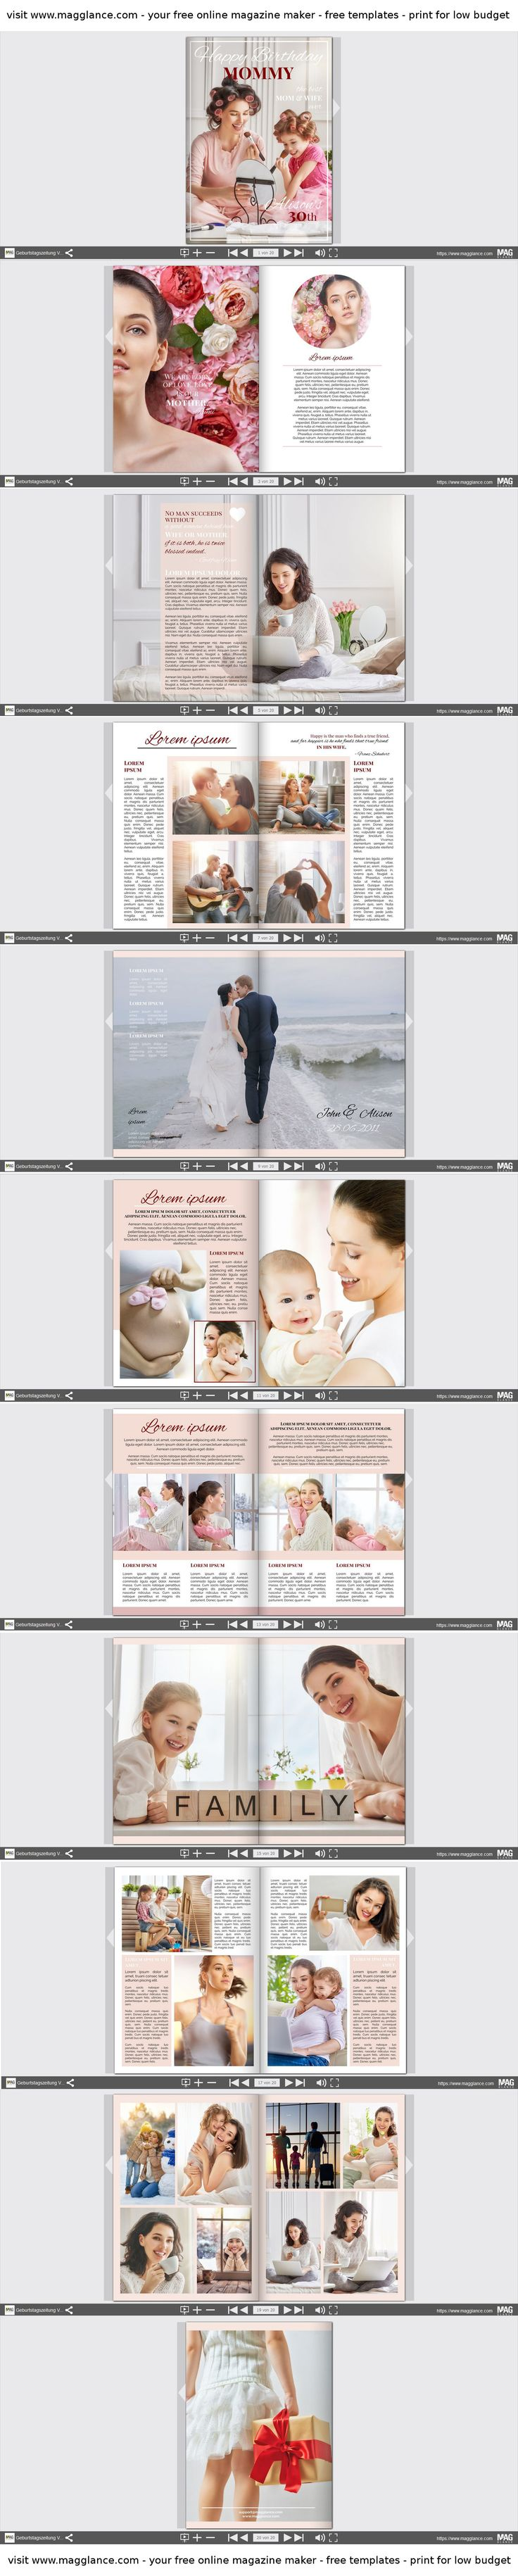 34 best Media Kit images on Pinterest | Makeup hairstyle, Media kit ...